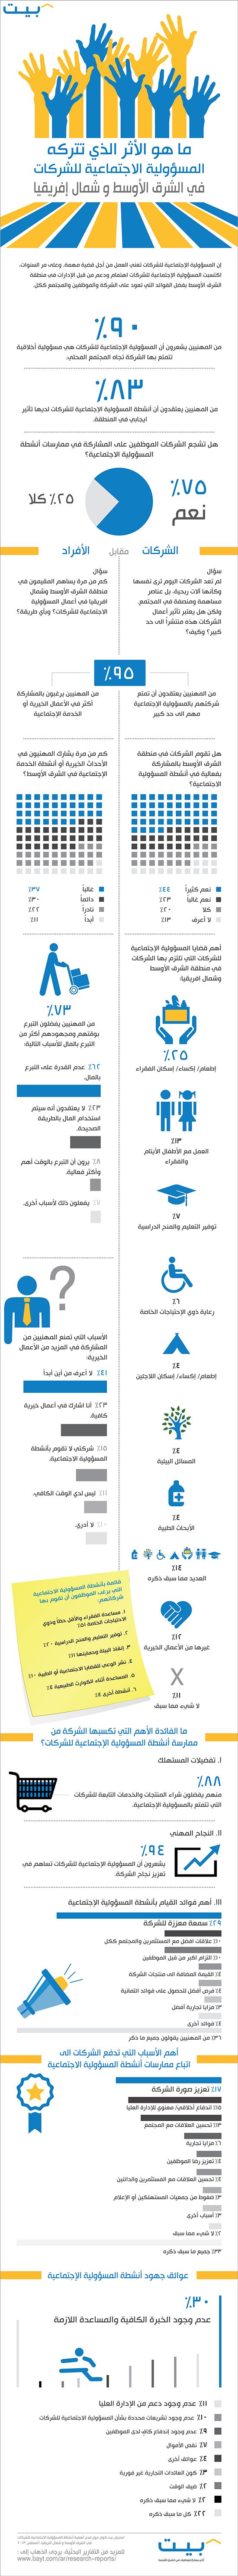 Bayt_Infographic